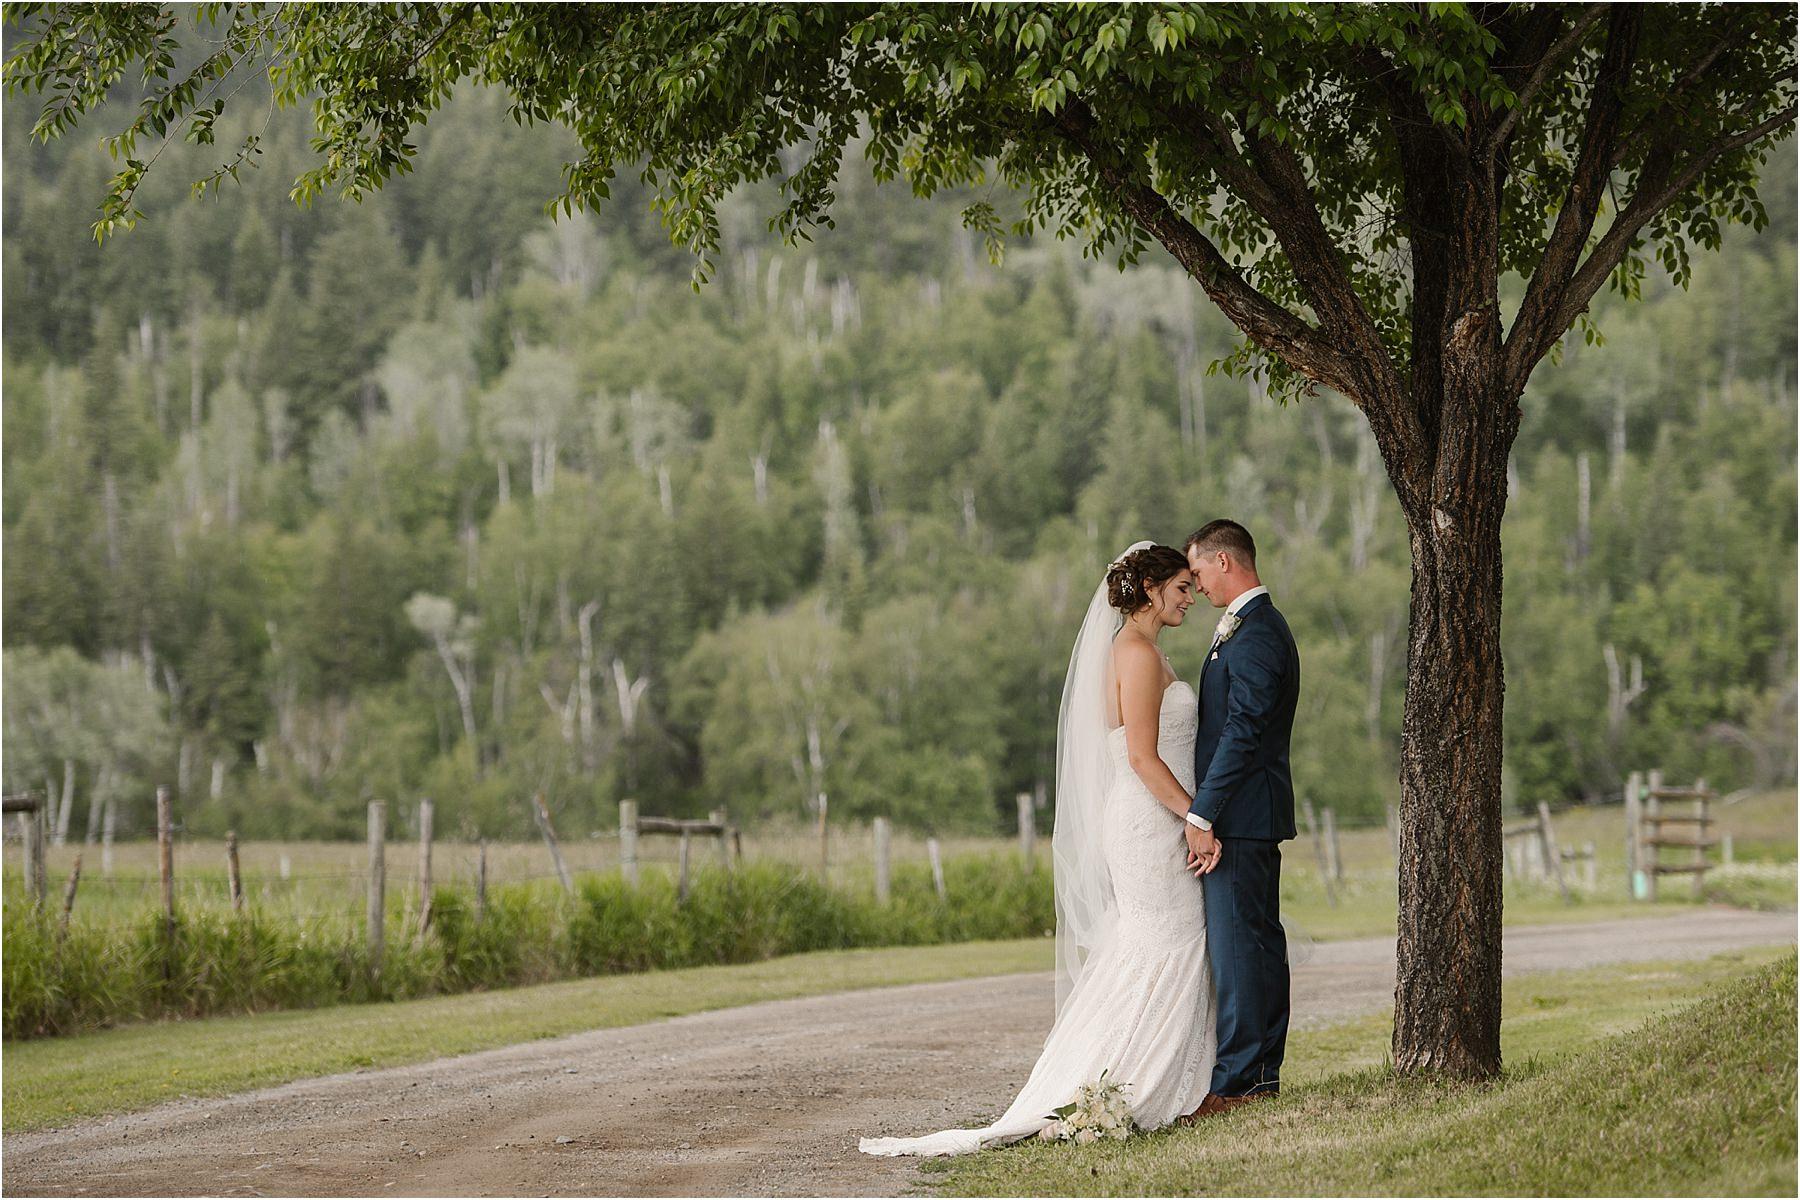 Kamloops wedding photographer quiet moment bridal portrait bride and groom rainy wedding romance blue tux